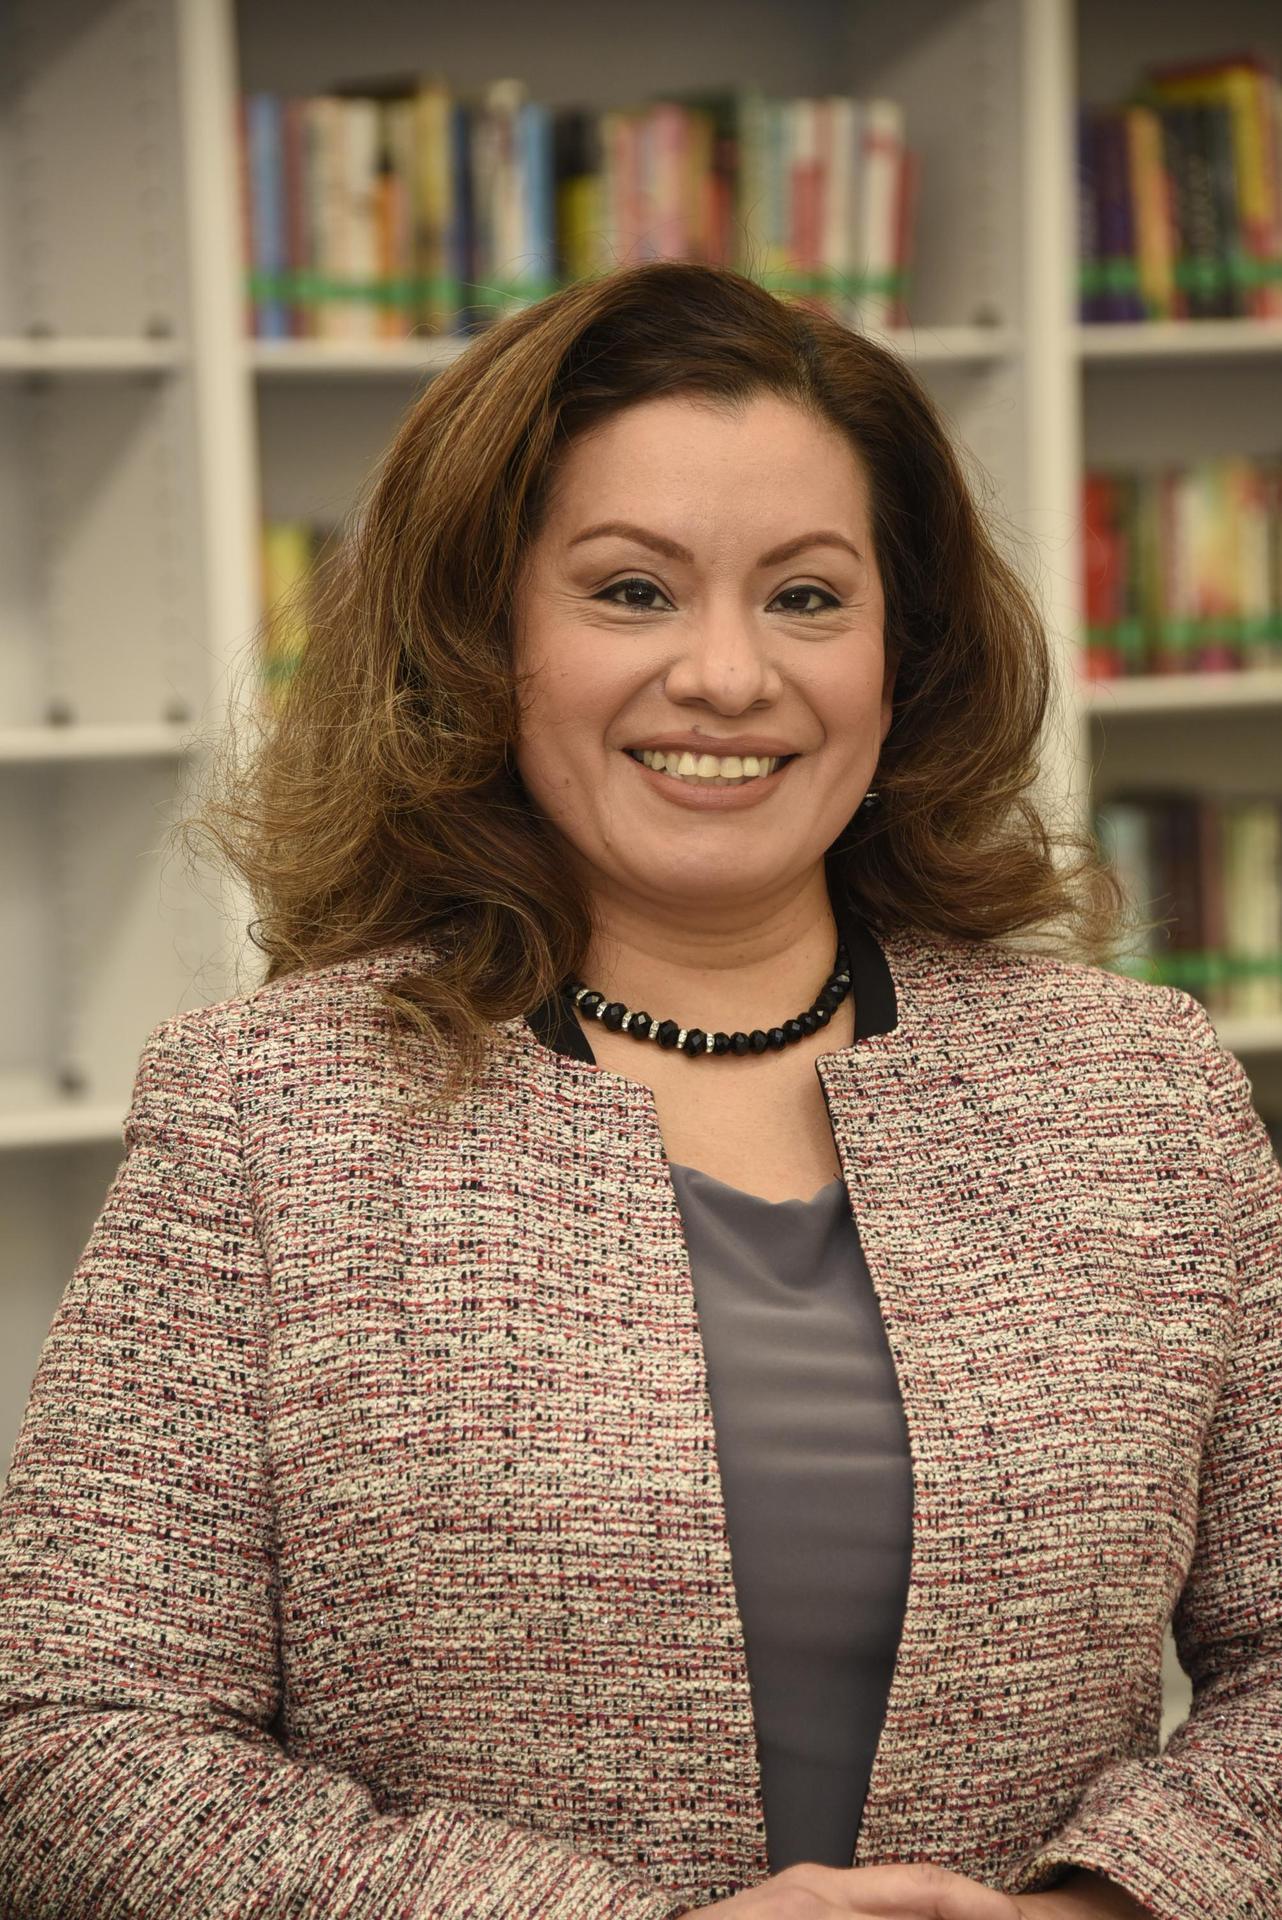 Liliana Baez-Molina